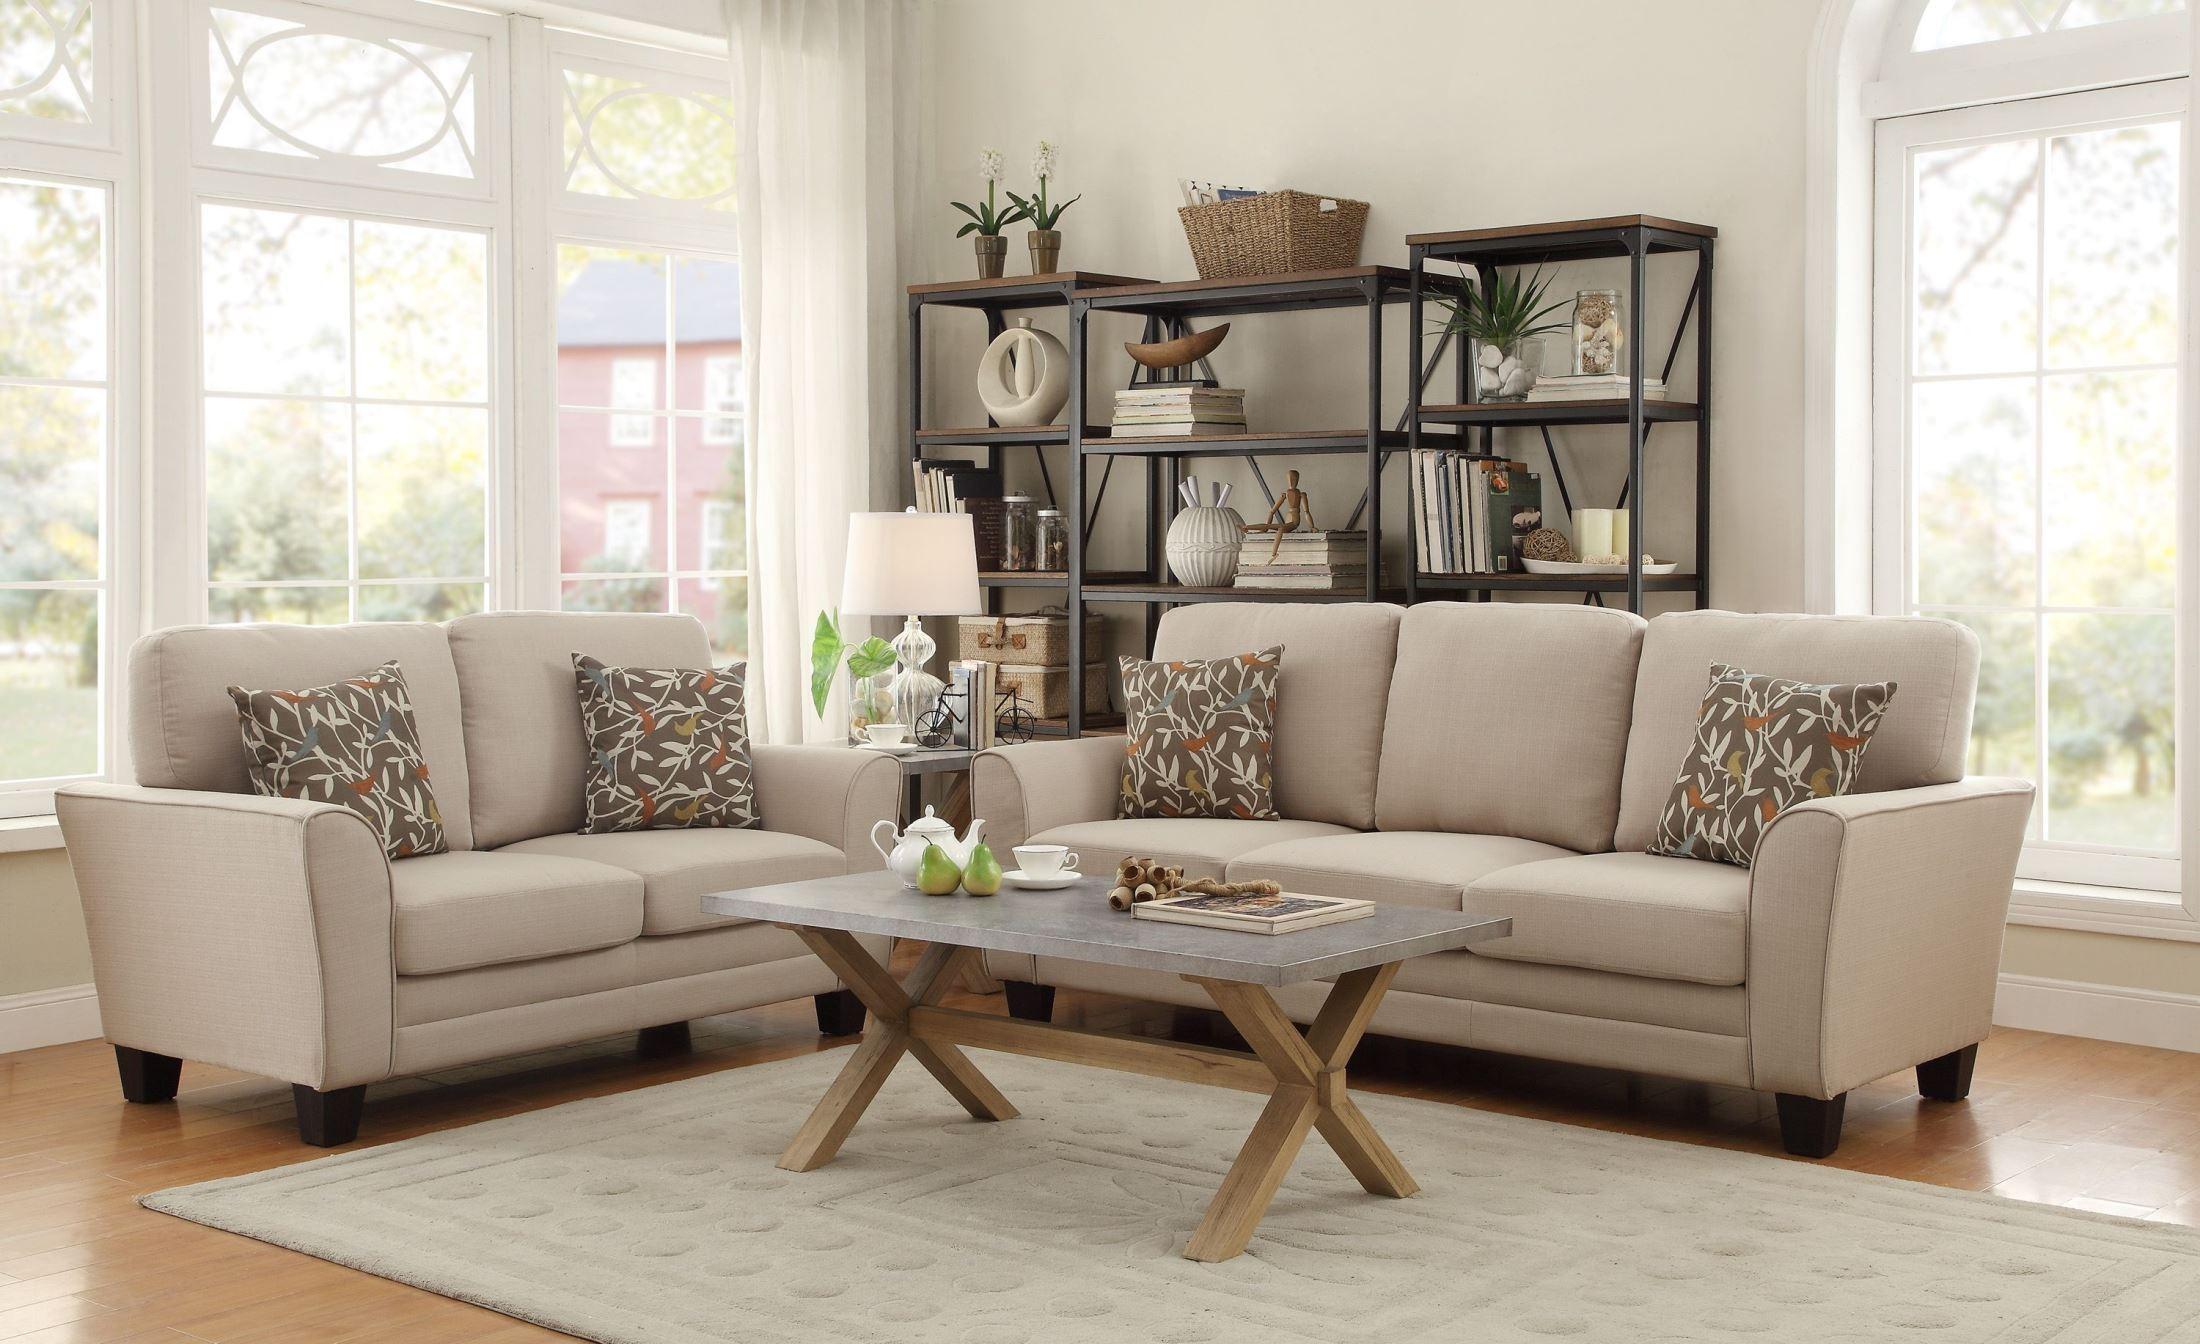 adair beige living room set from homelegance 8413be 3 coleman furniture